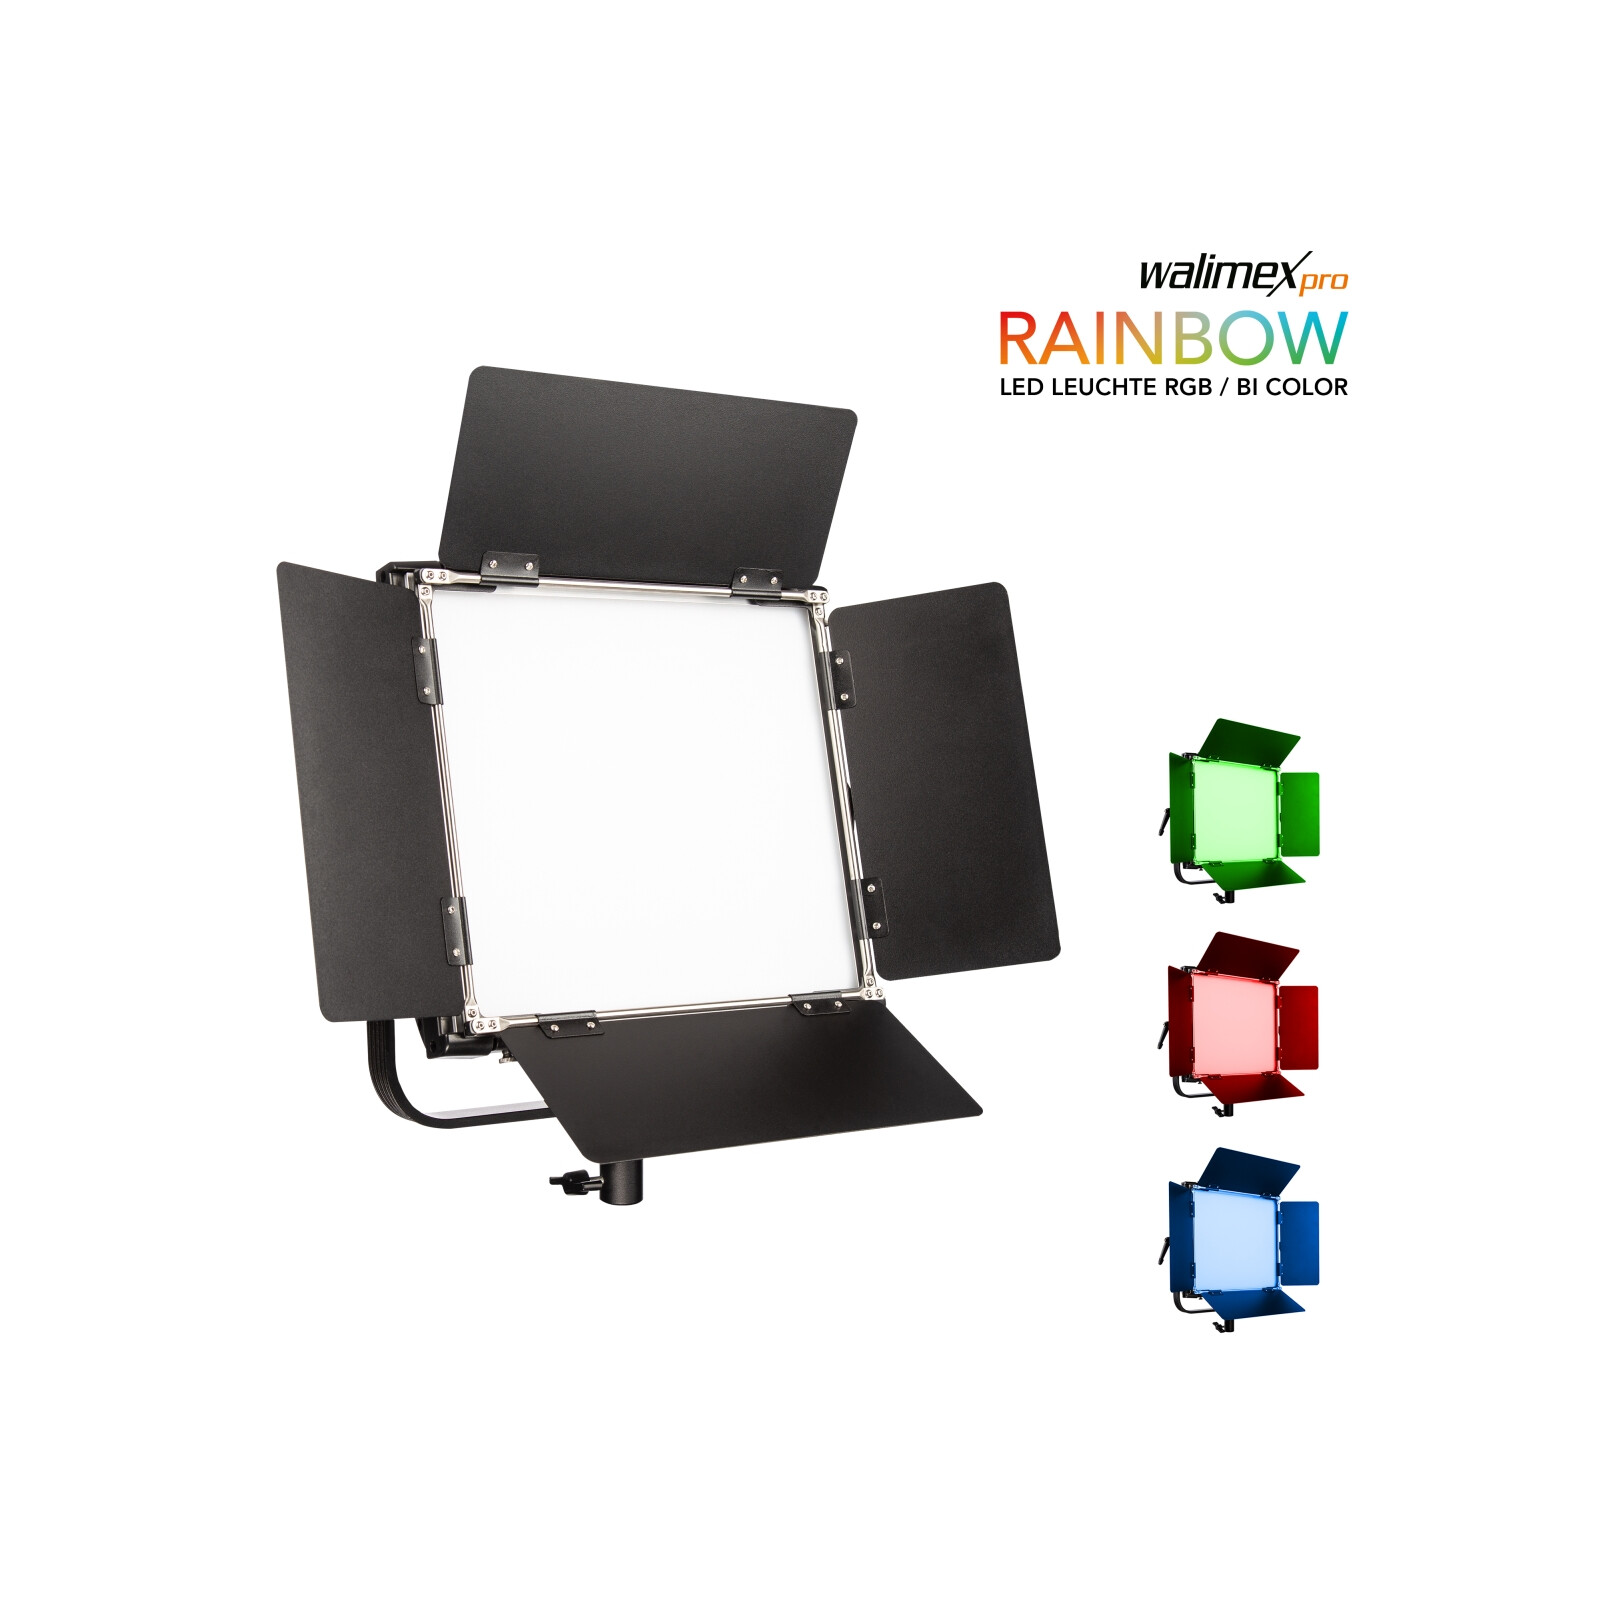 Walimex pro LED Rainbow 50W RGBWW Flächenleuchte